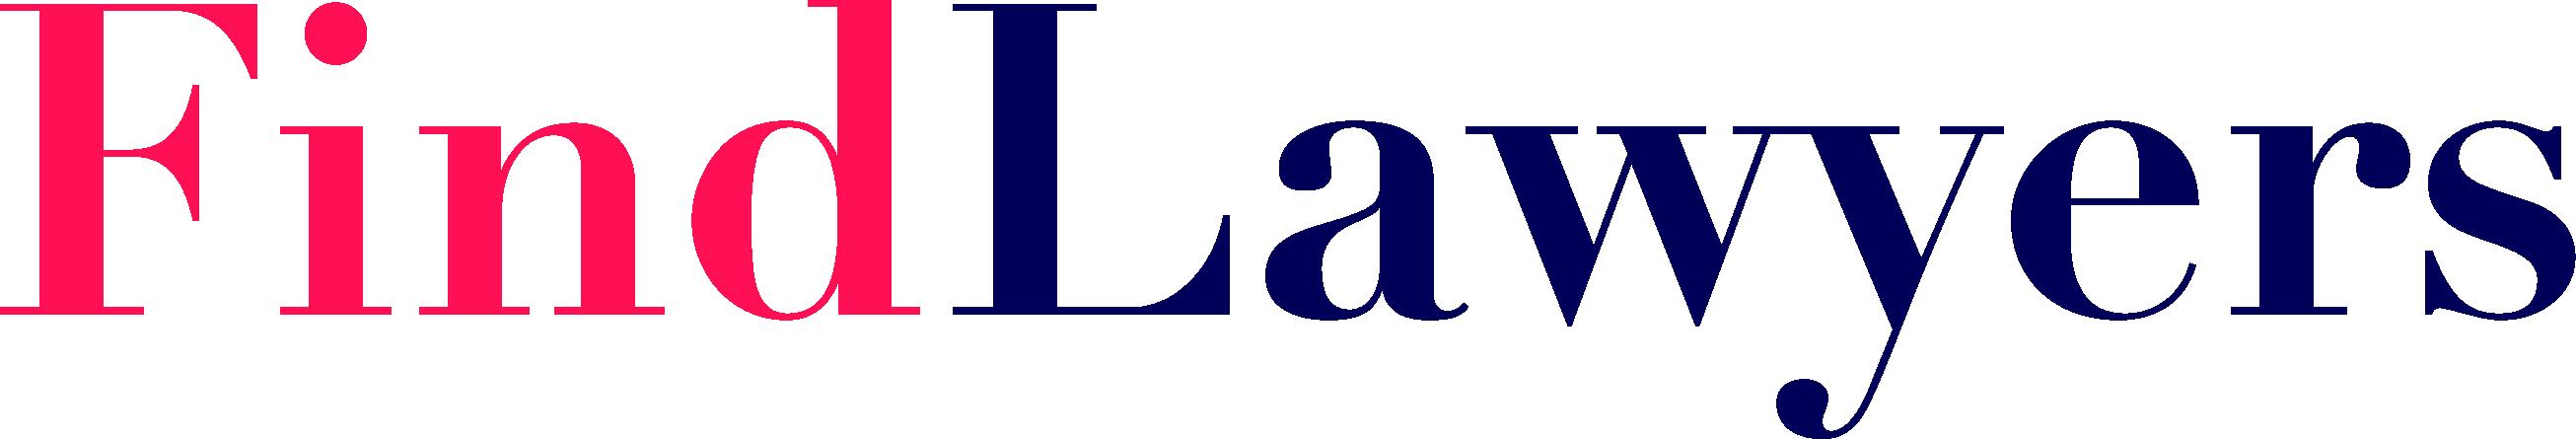 legal help logo